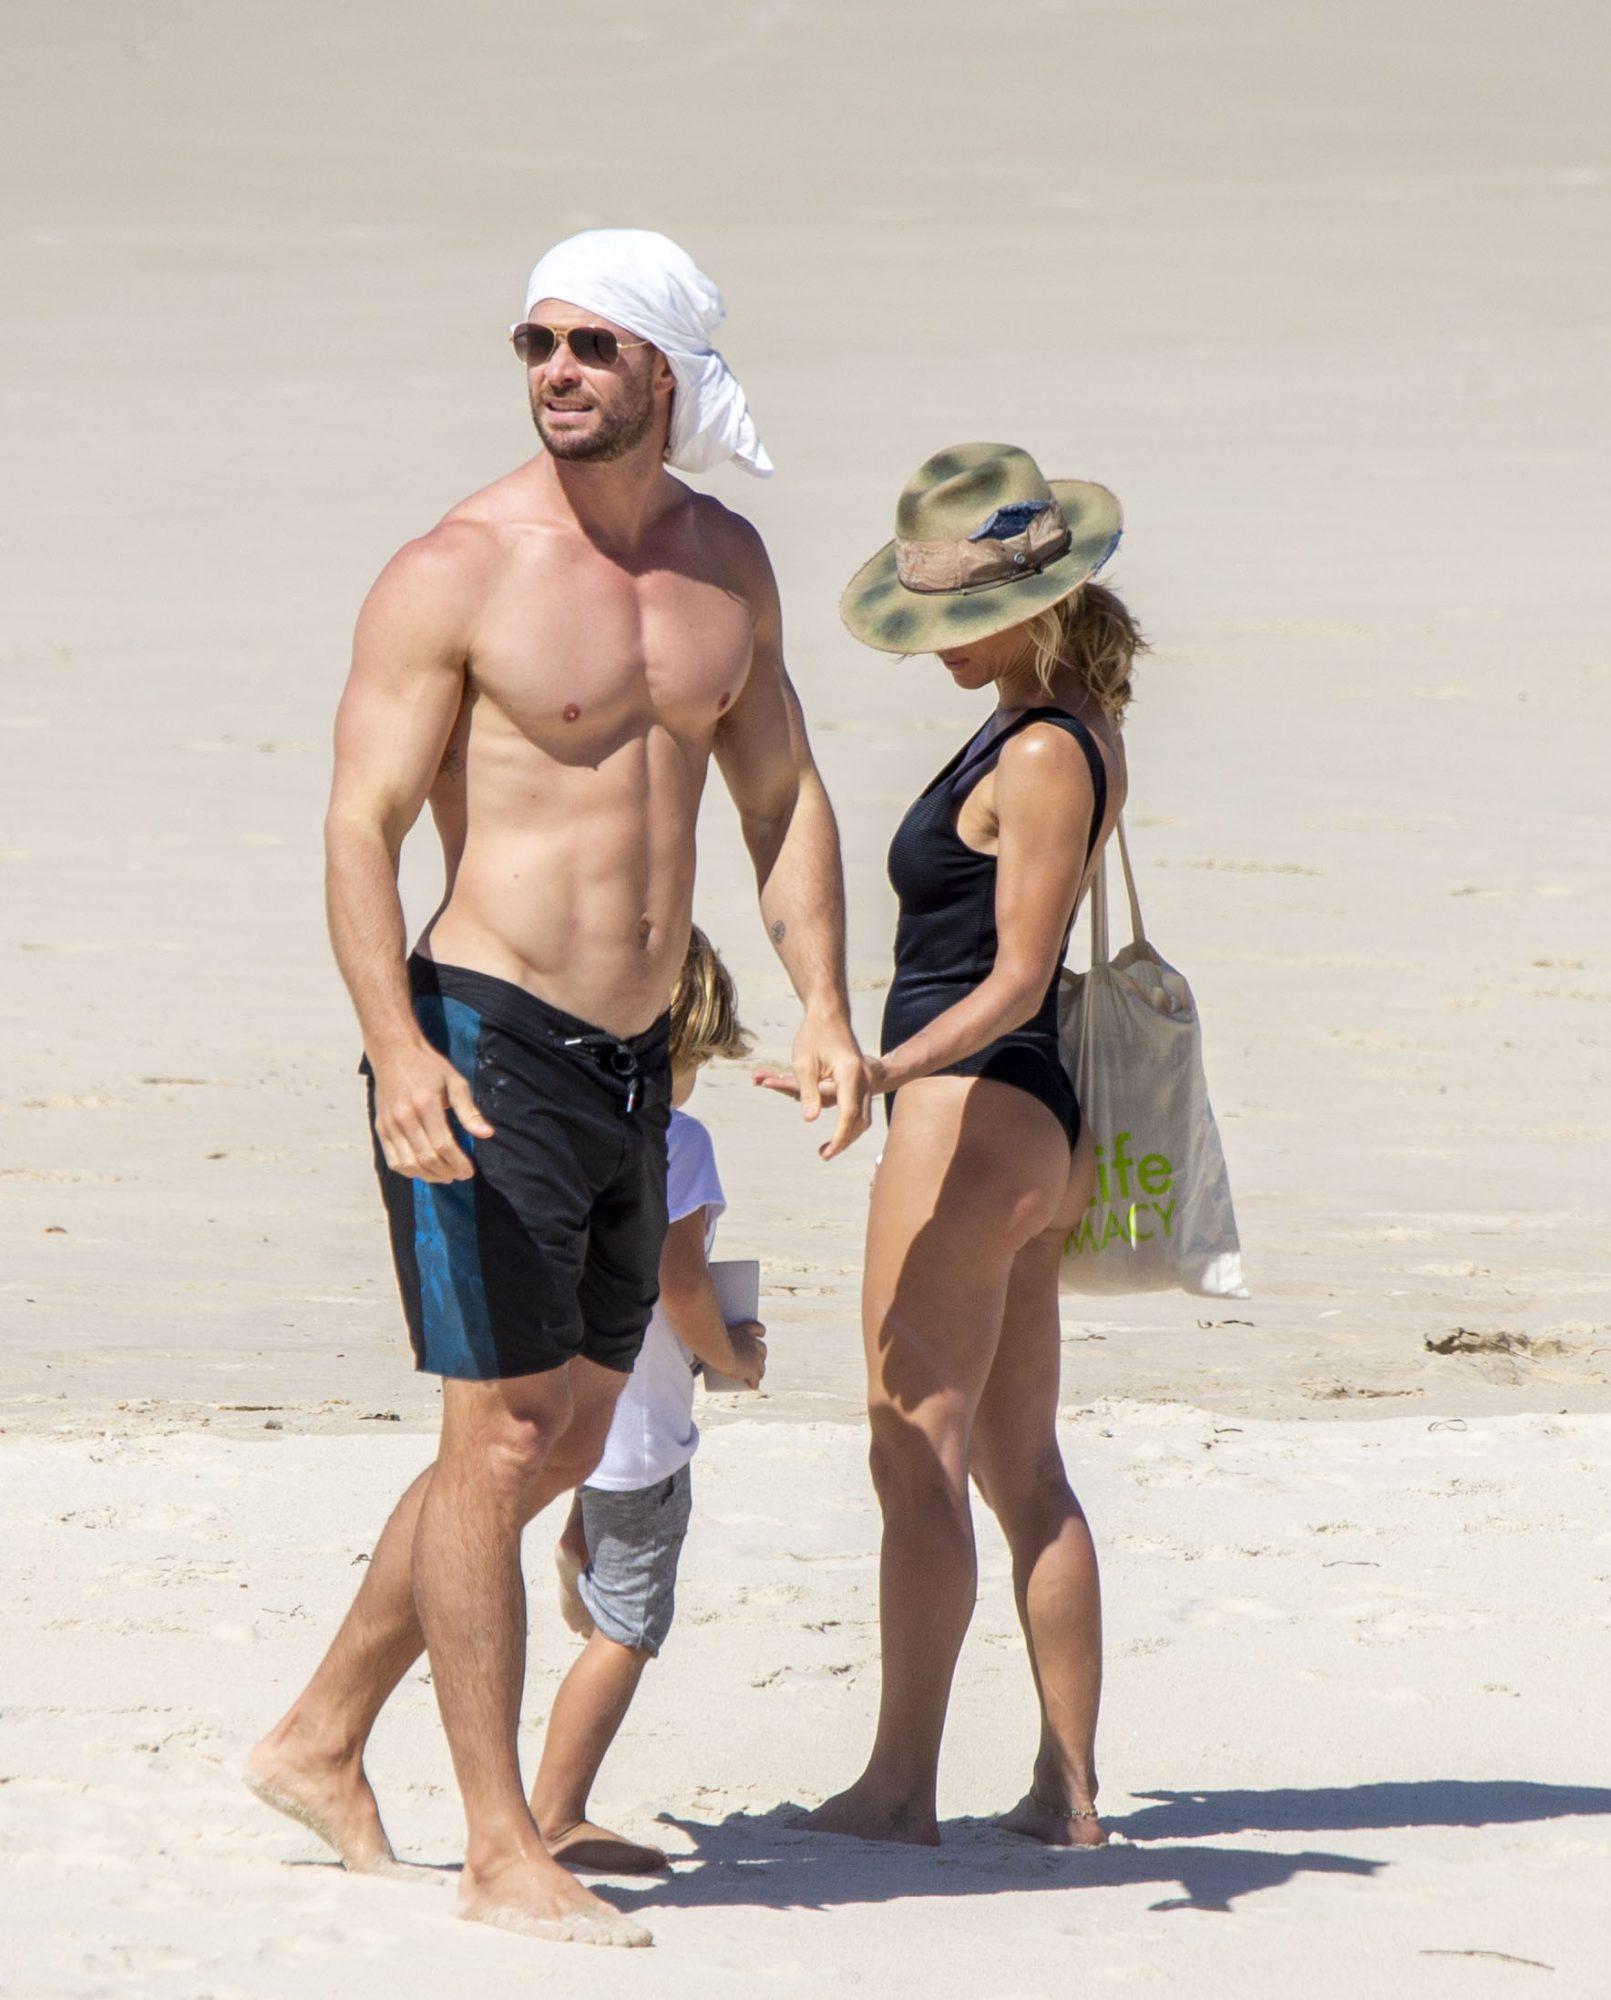 Chris Hemsworth playa en Australia con esposa Elsa pataky